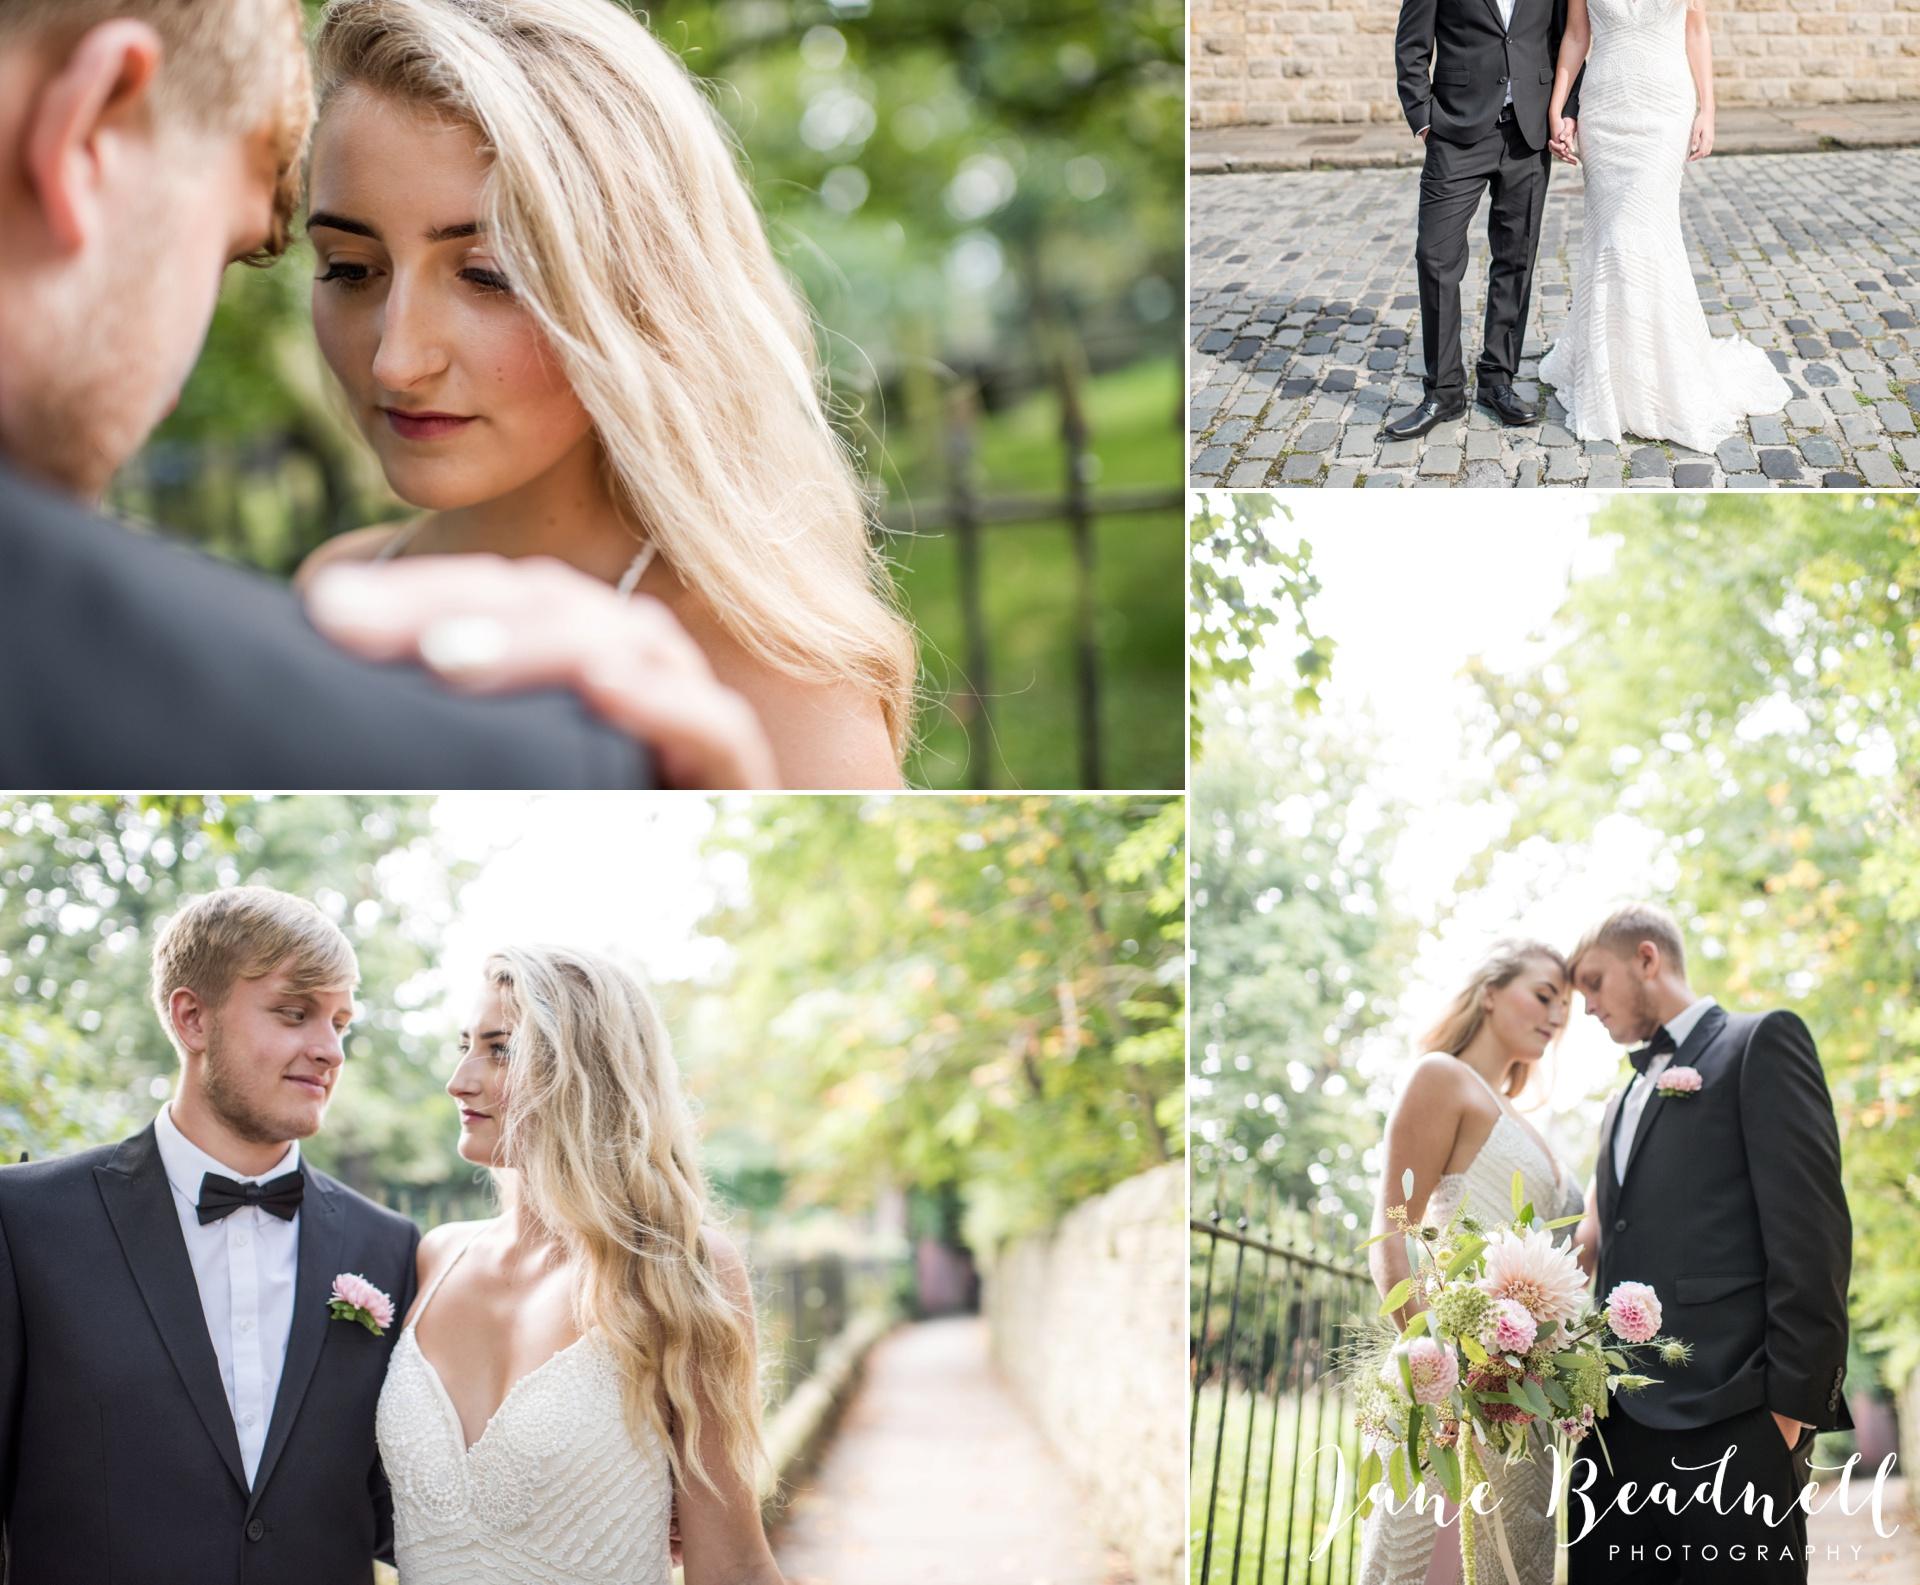 leafy-couture-wedding-flowers-otley-fine-art-wedding-photographer-jane-beadnell-photography_0103